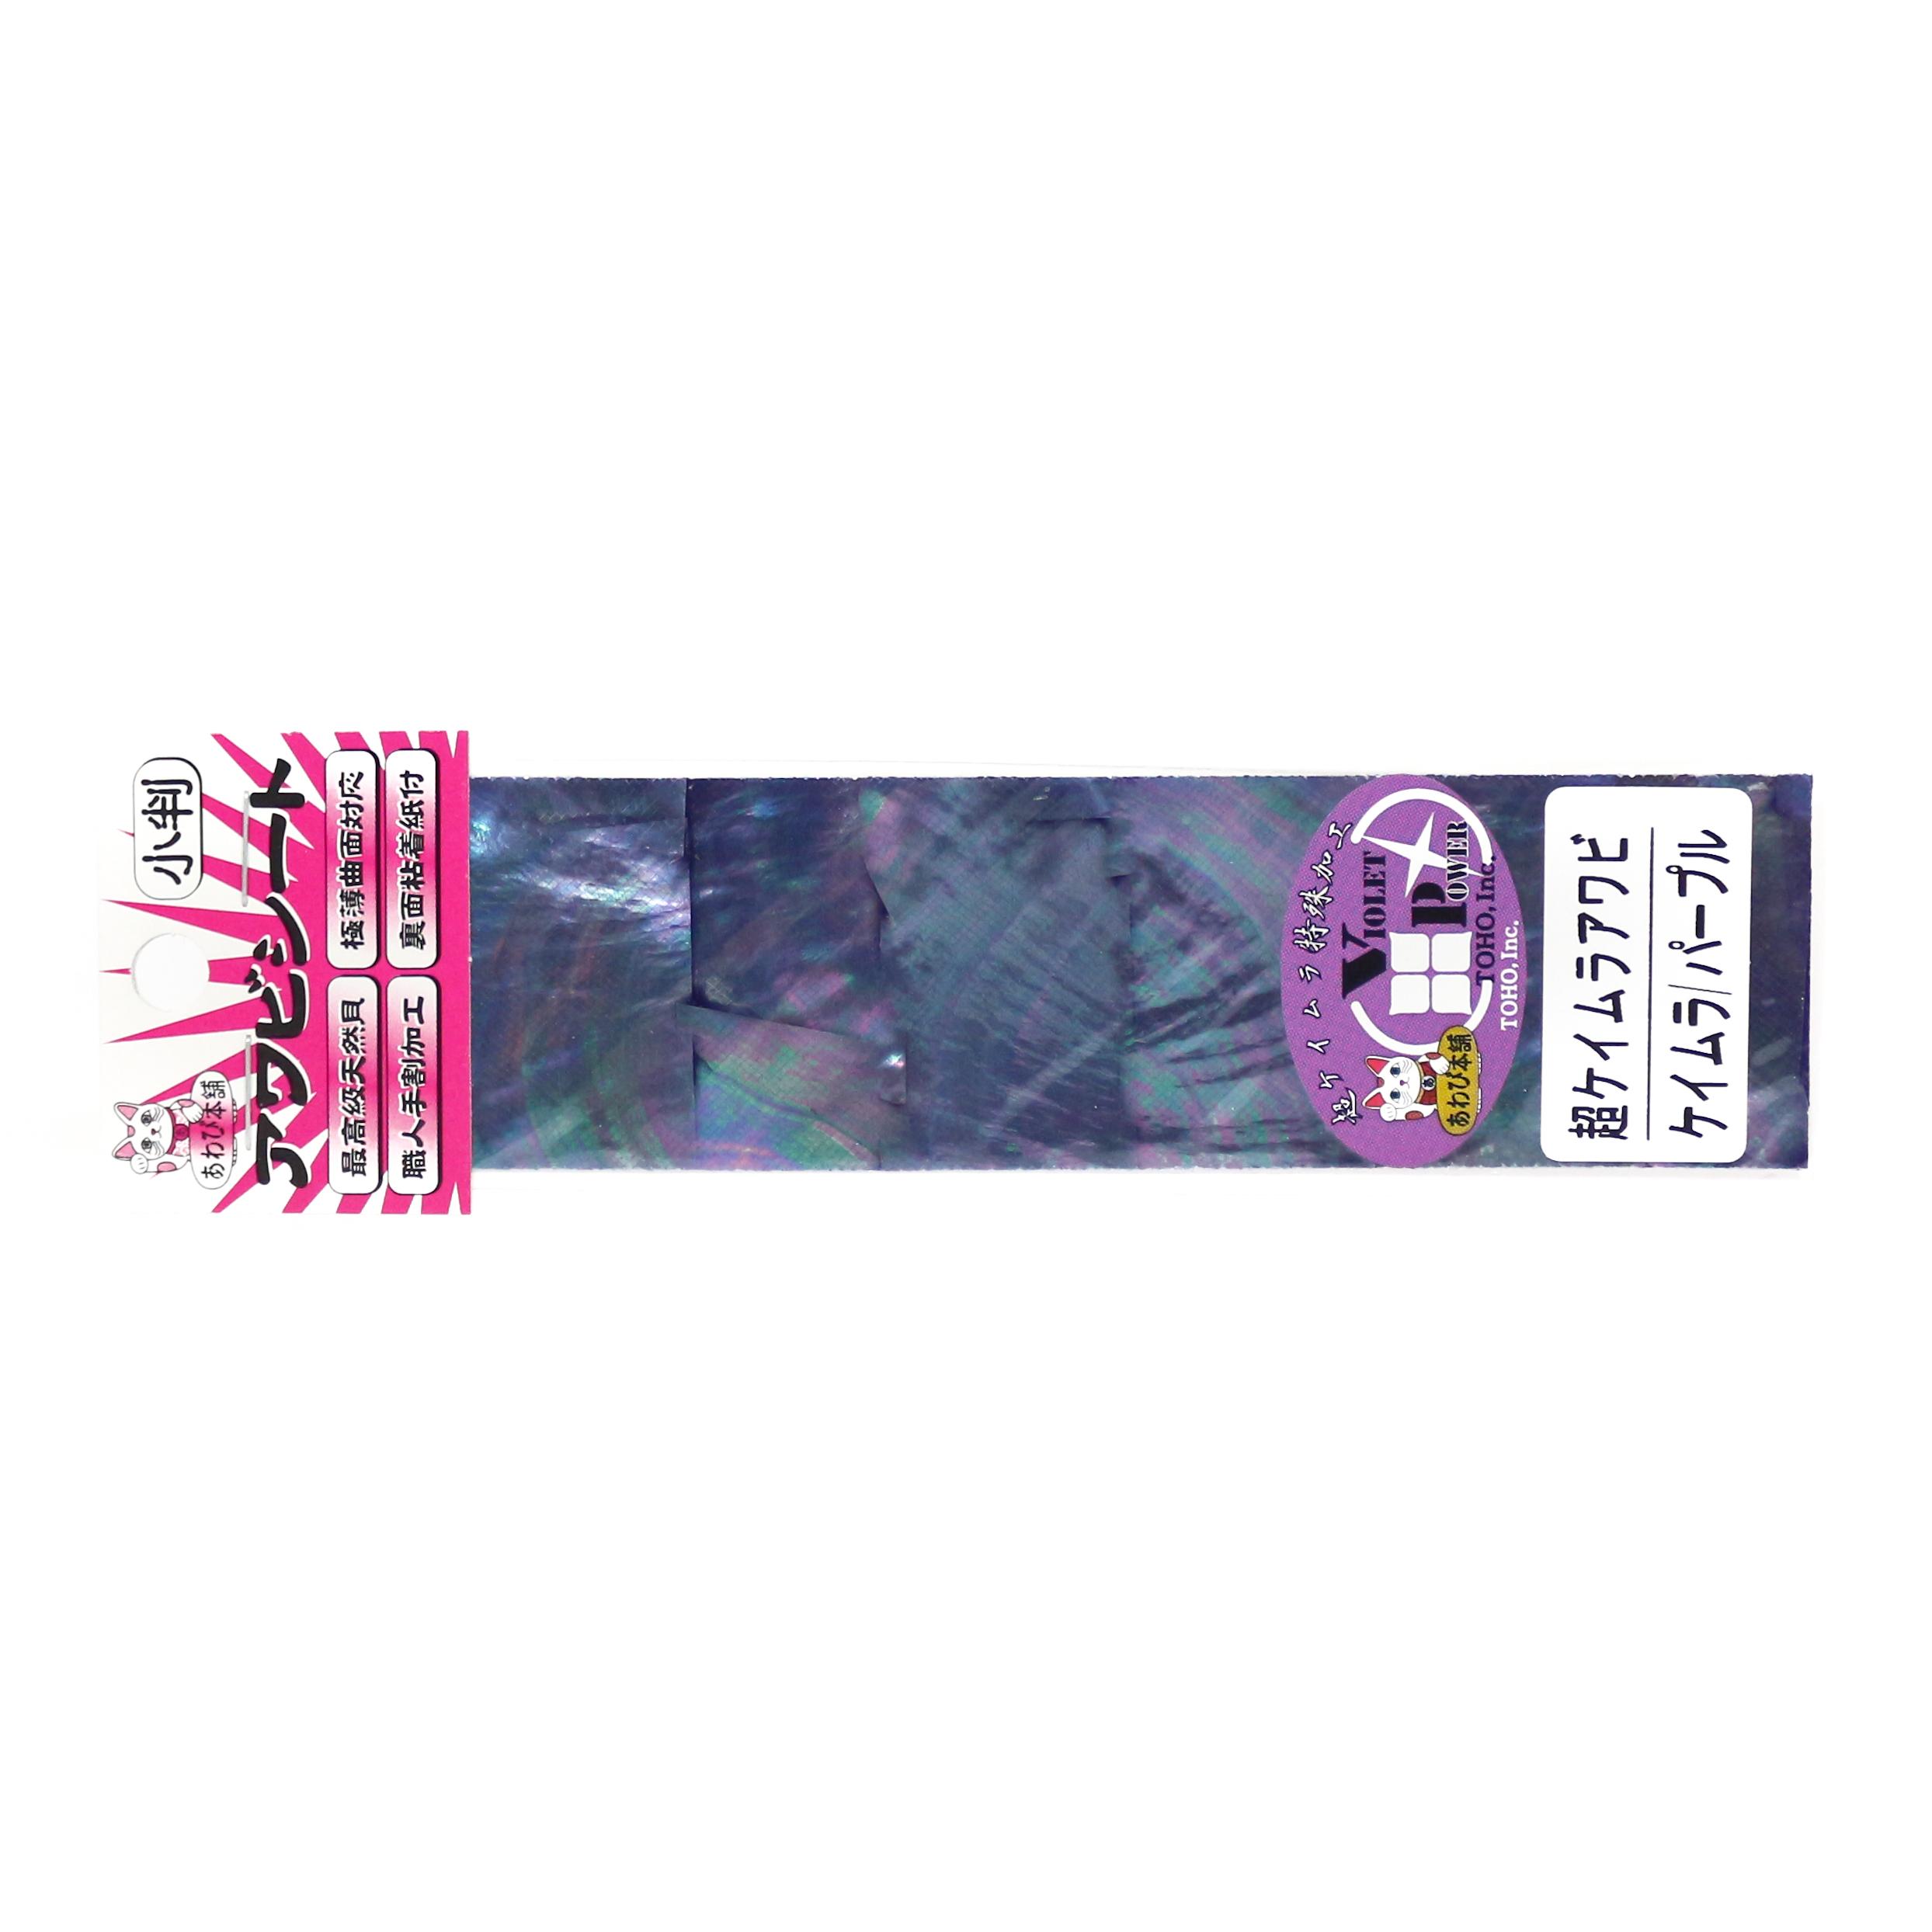 Sale Awabi Honpo Awabi Sheet Keimura Size S 40 x 140 mm Purple (1111)